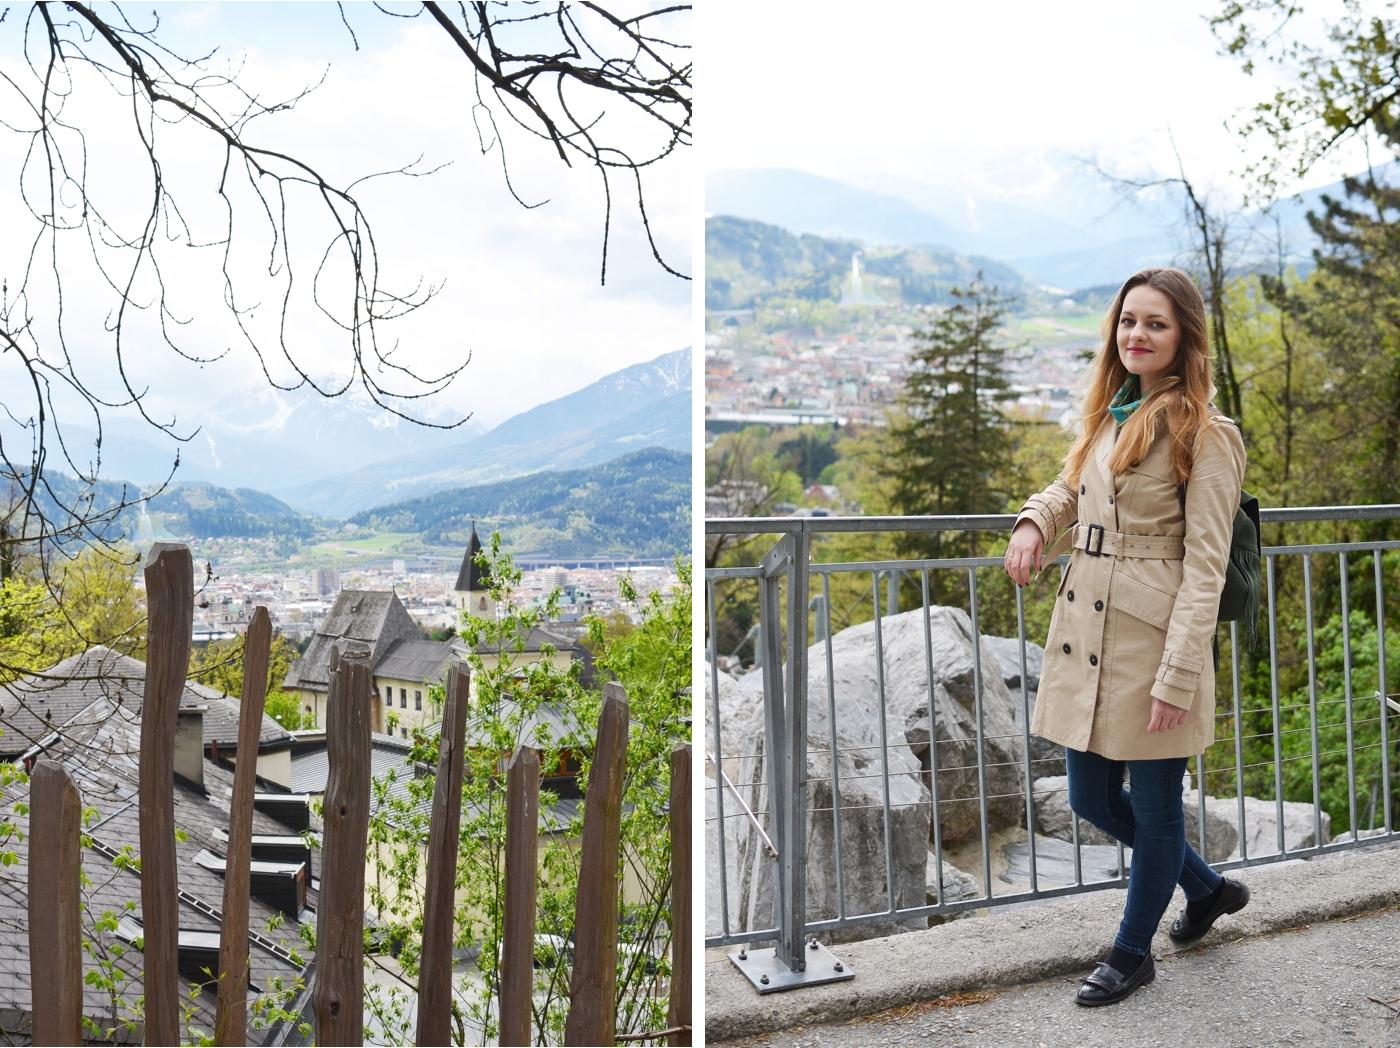 Innsbruck - Alpenzoo